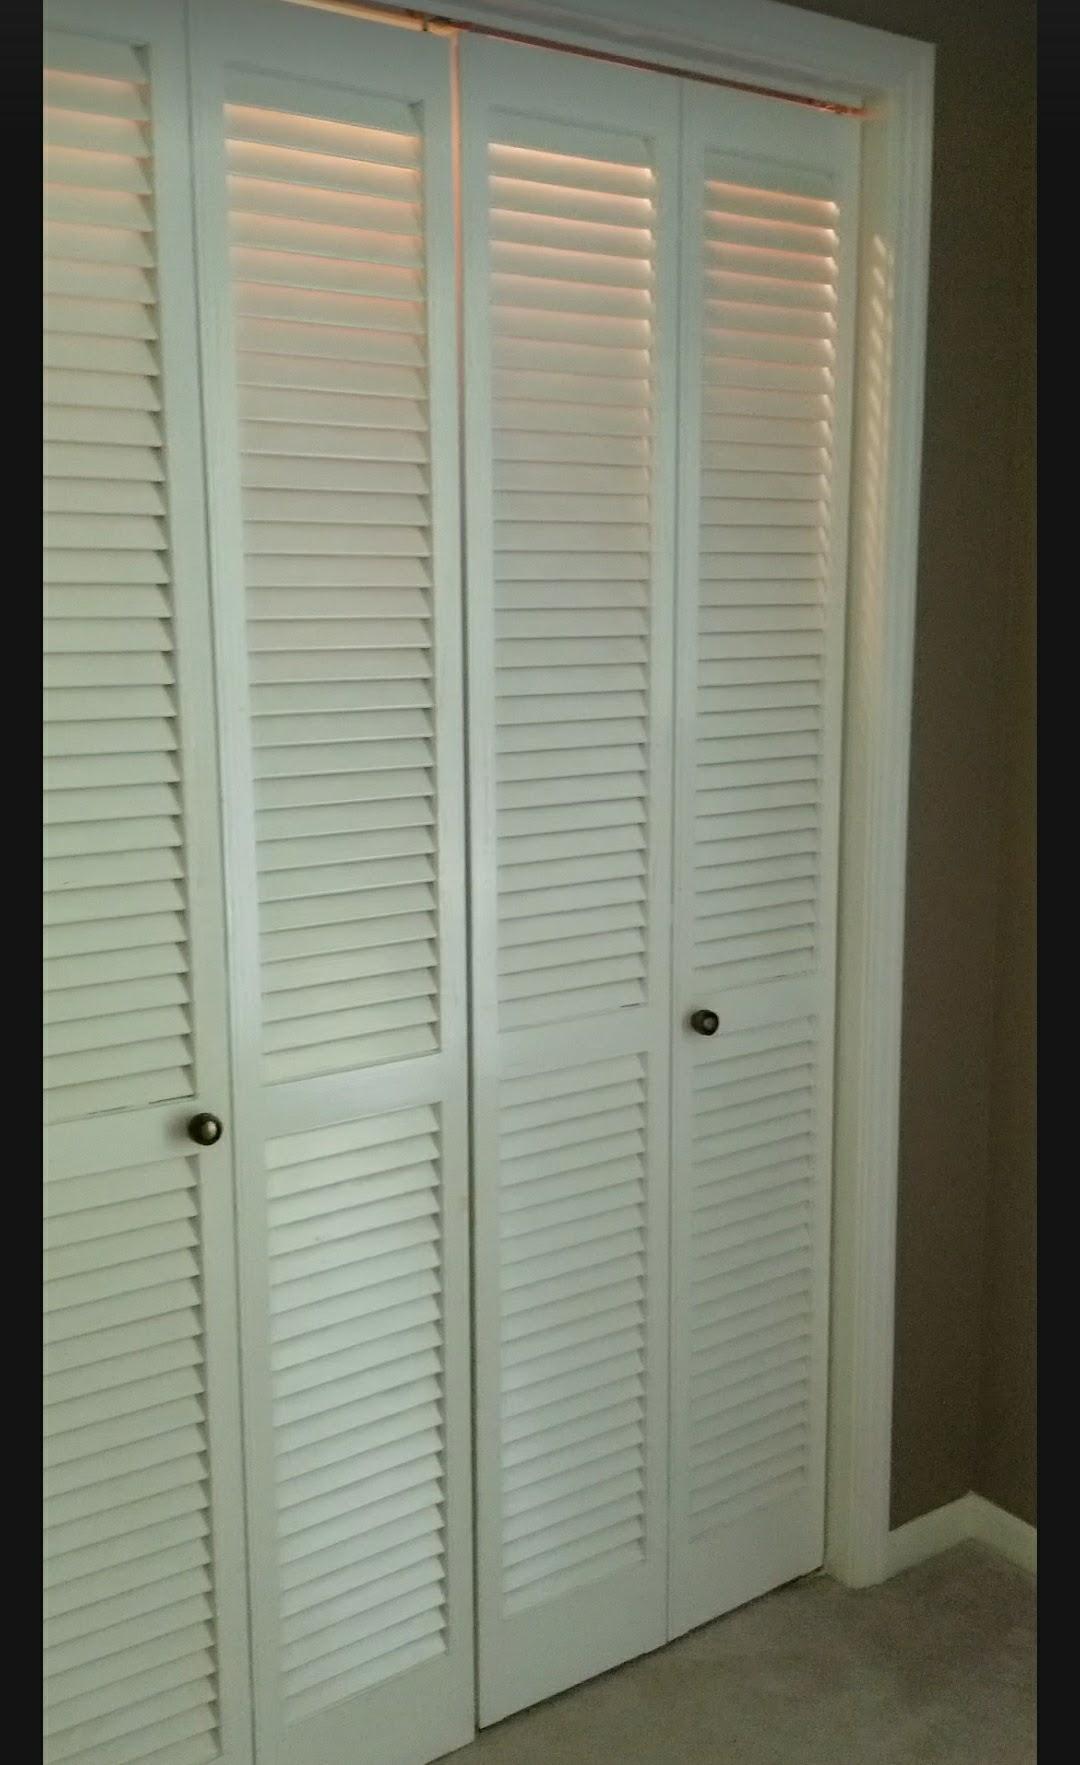 Bye Bye Fold Doors Shiplap Inspired Closet Door Makeover Shabby Paints